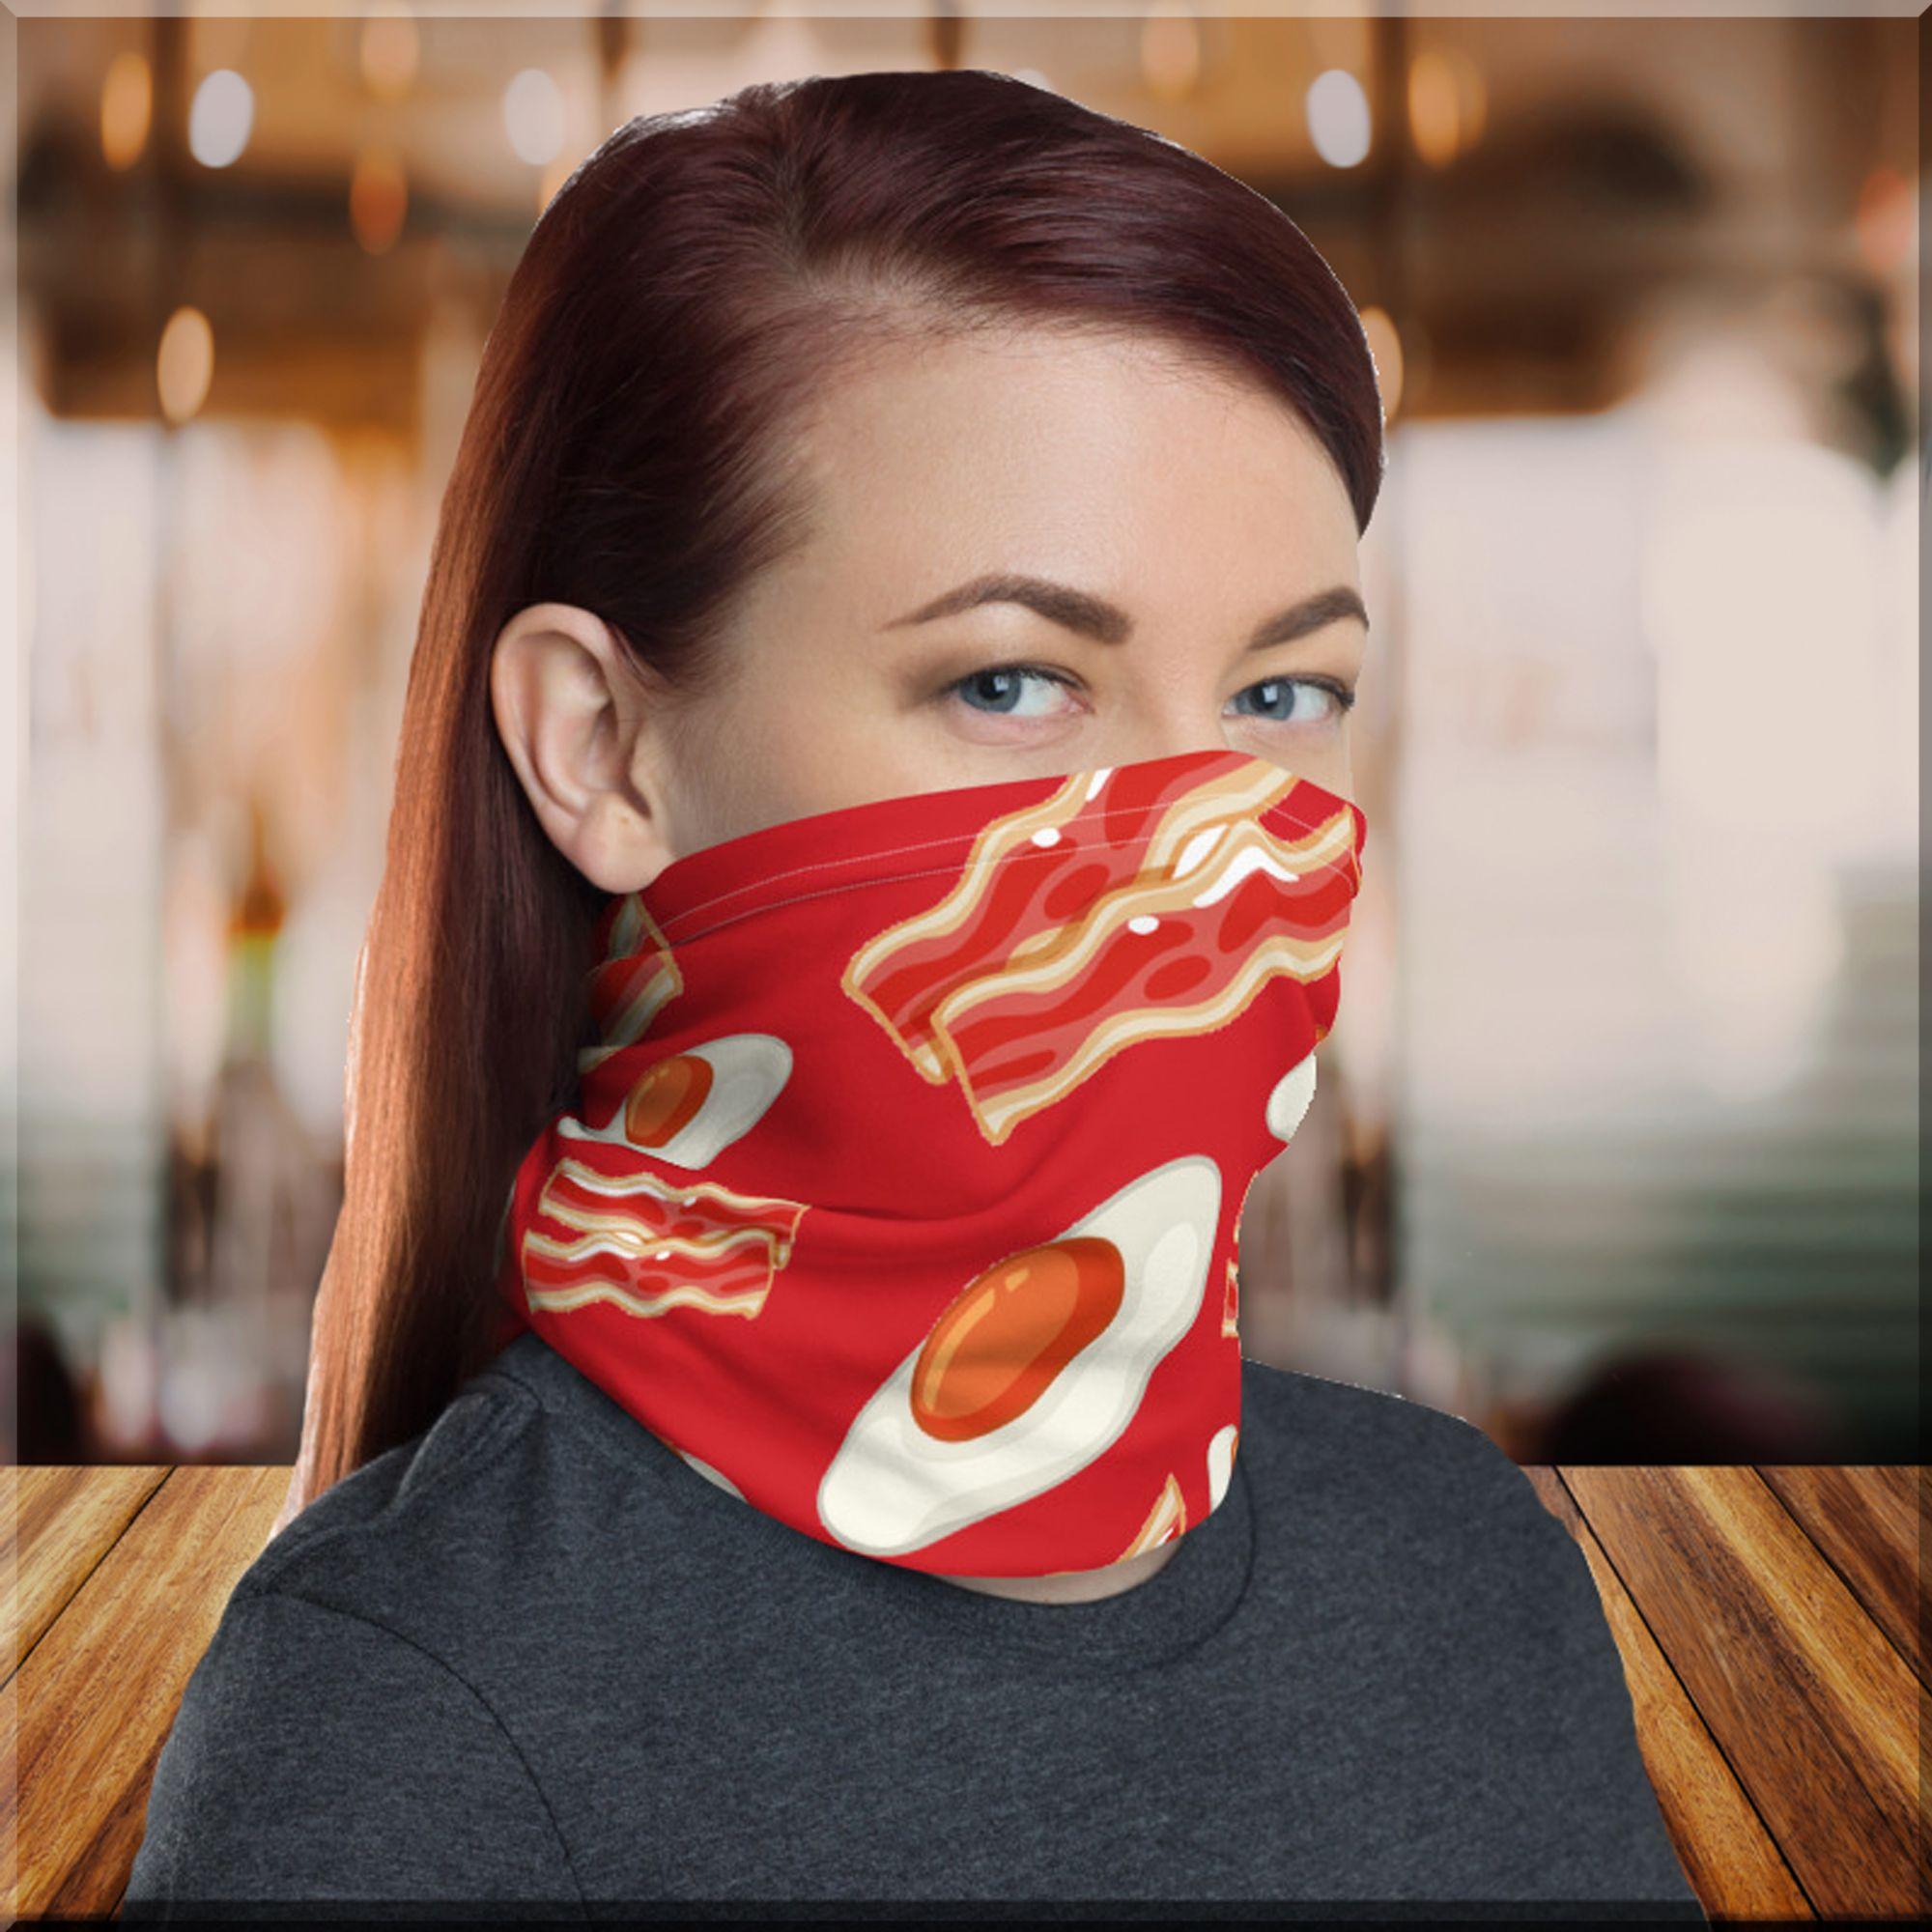 The Breakfast Club Neck Gaiter Face Cover Bandana Scarf Face Mask Neck Warmer Headband Urban Fashion Accessory In 2020 Neck Gaiter Gaiters Neck Warmer